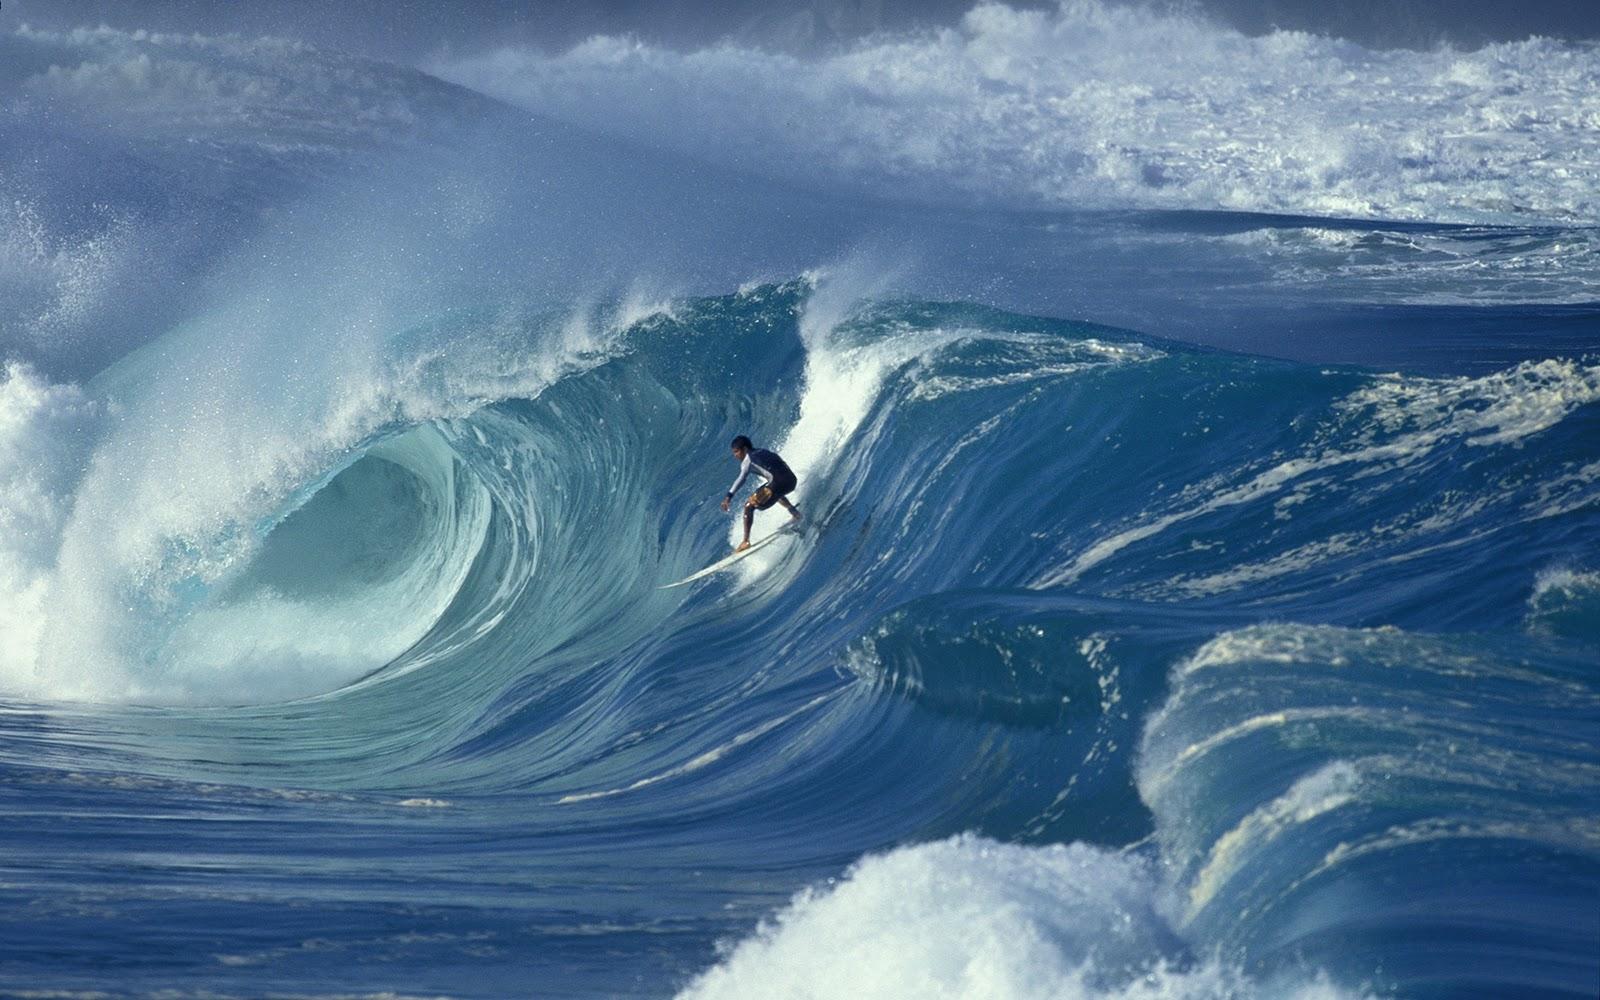 69 Surfer Wallpaper On Wallpapersafari